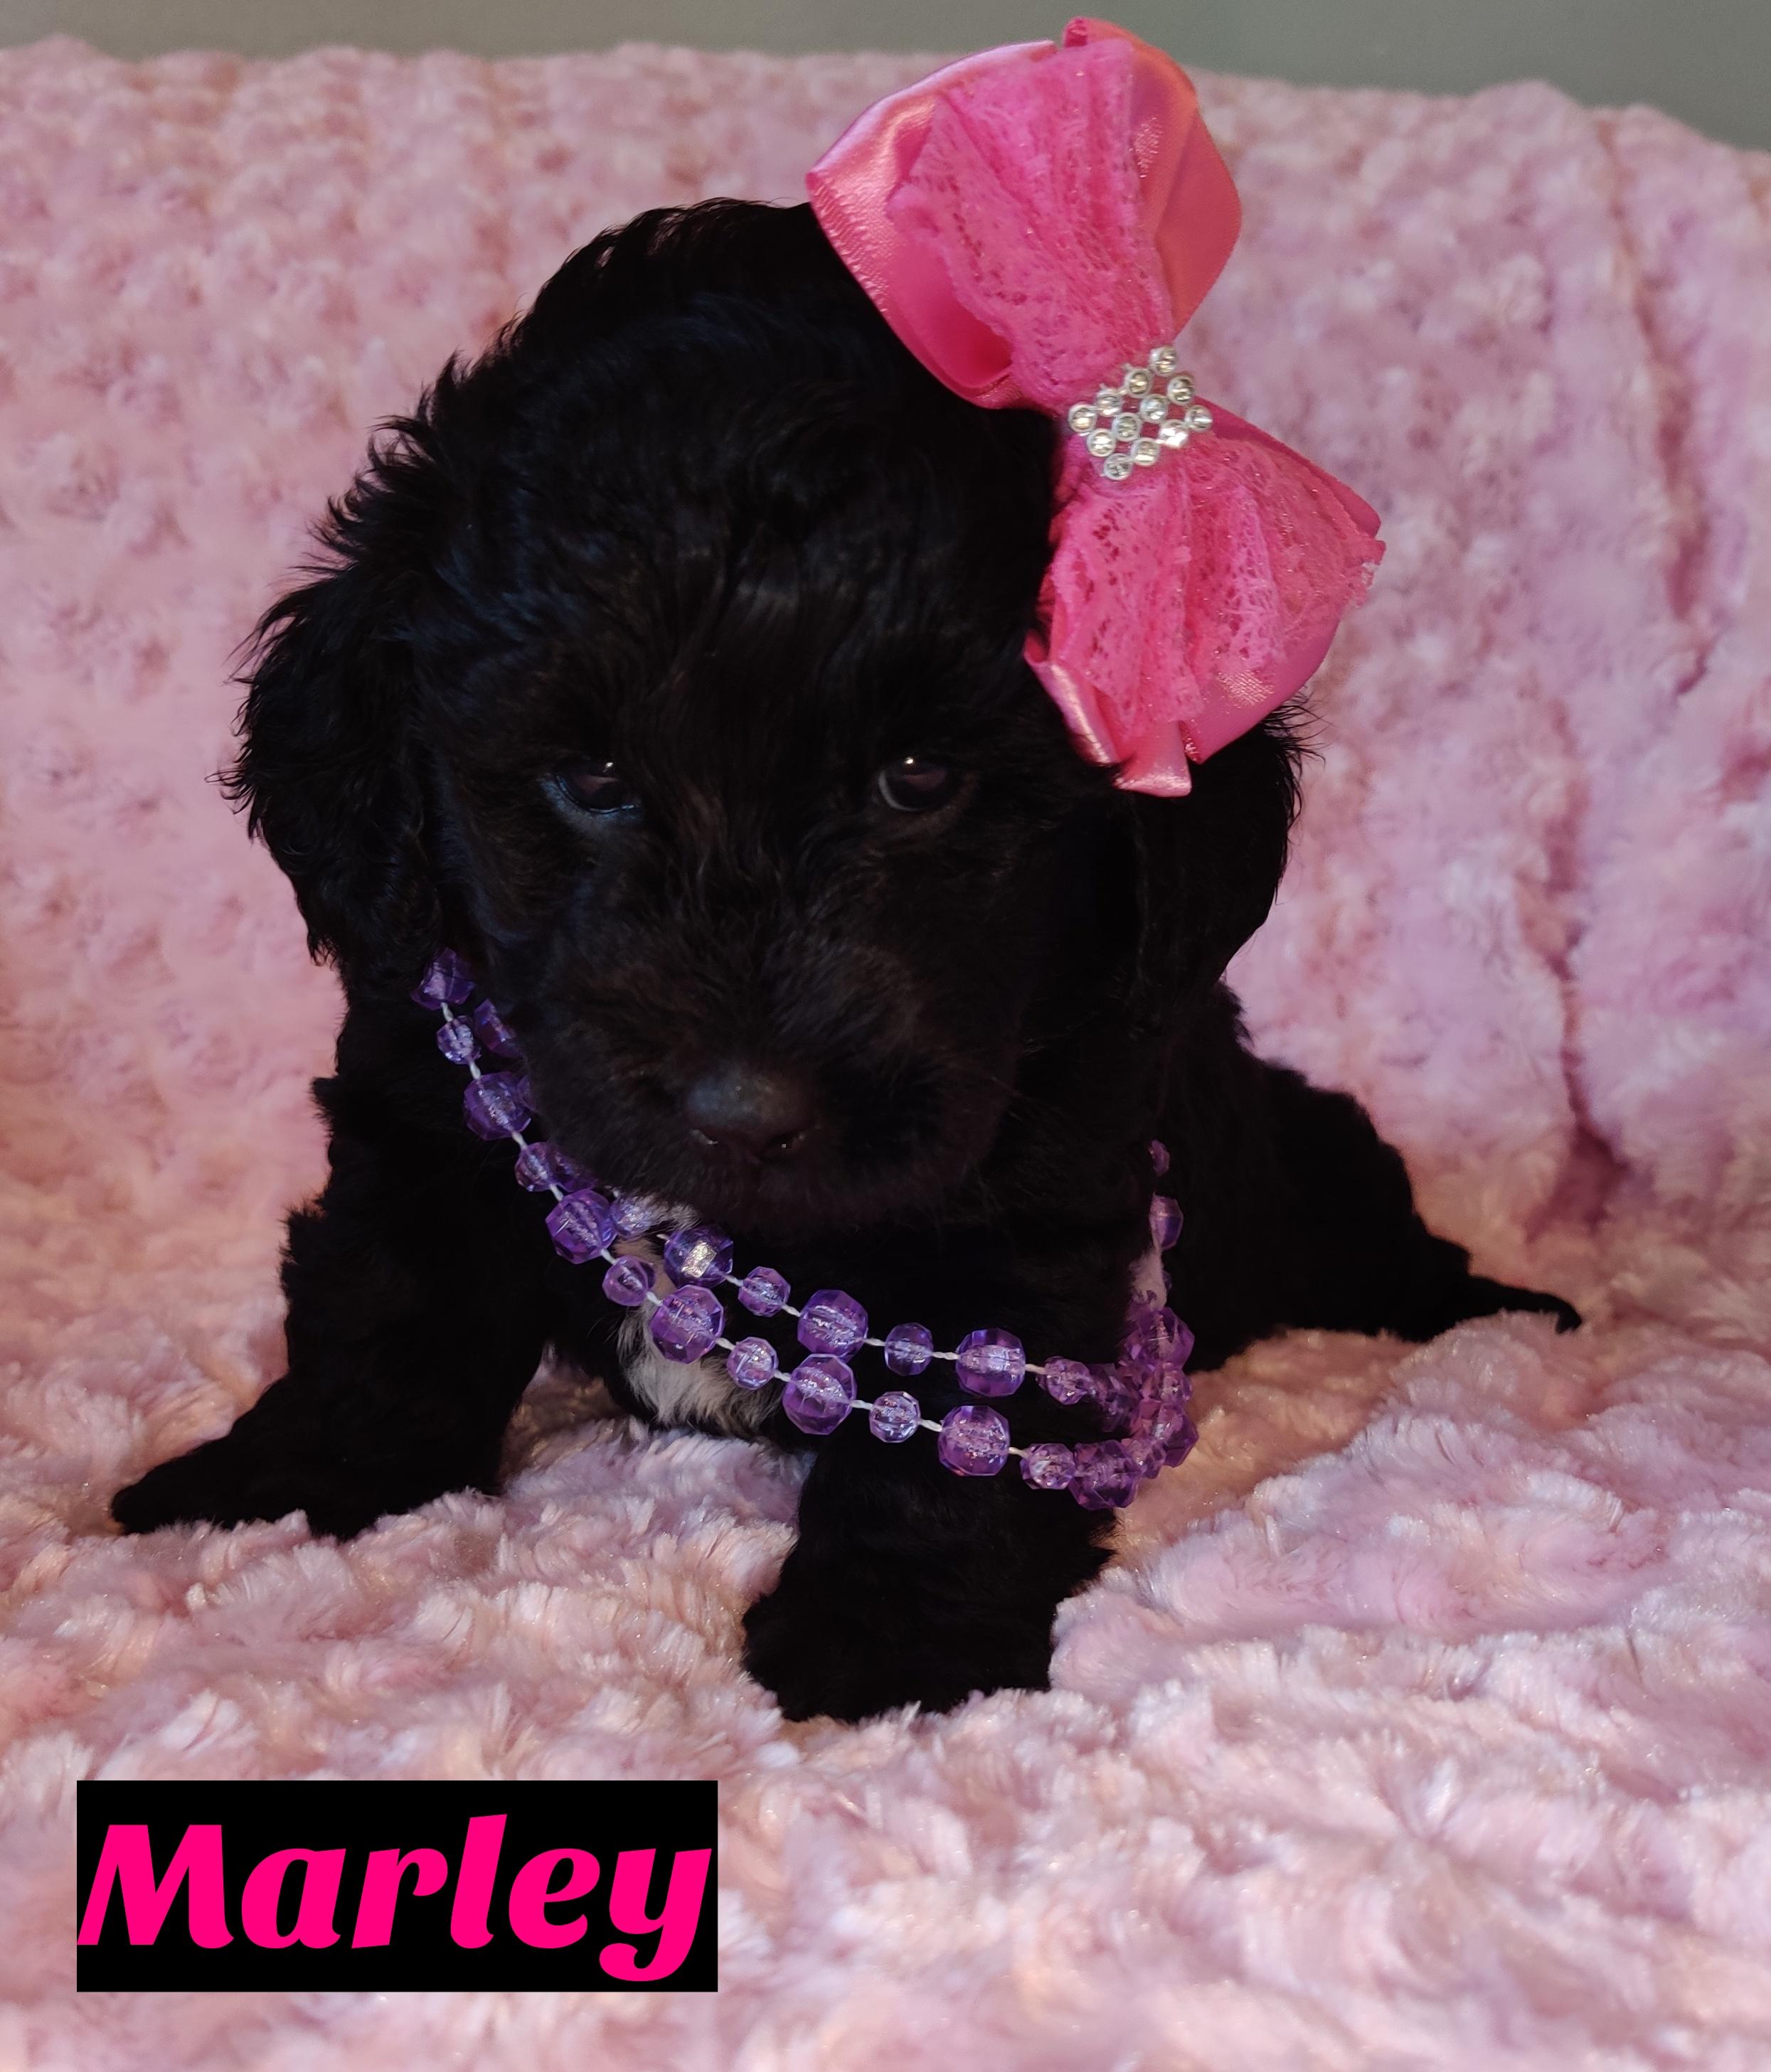 Marley Doggie Mini Goldendoodle For Sale Near Saint Cloud Florida